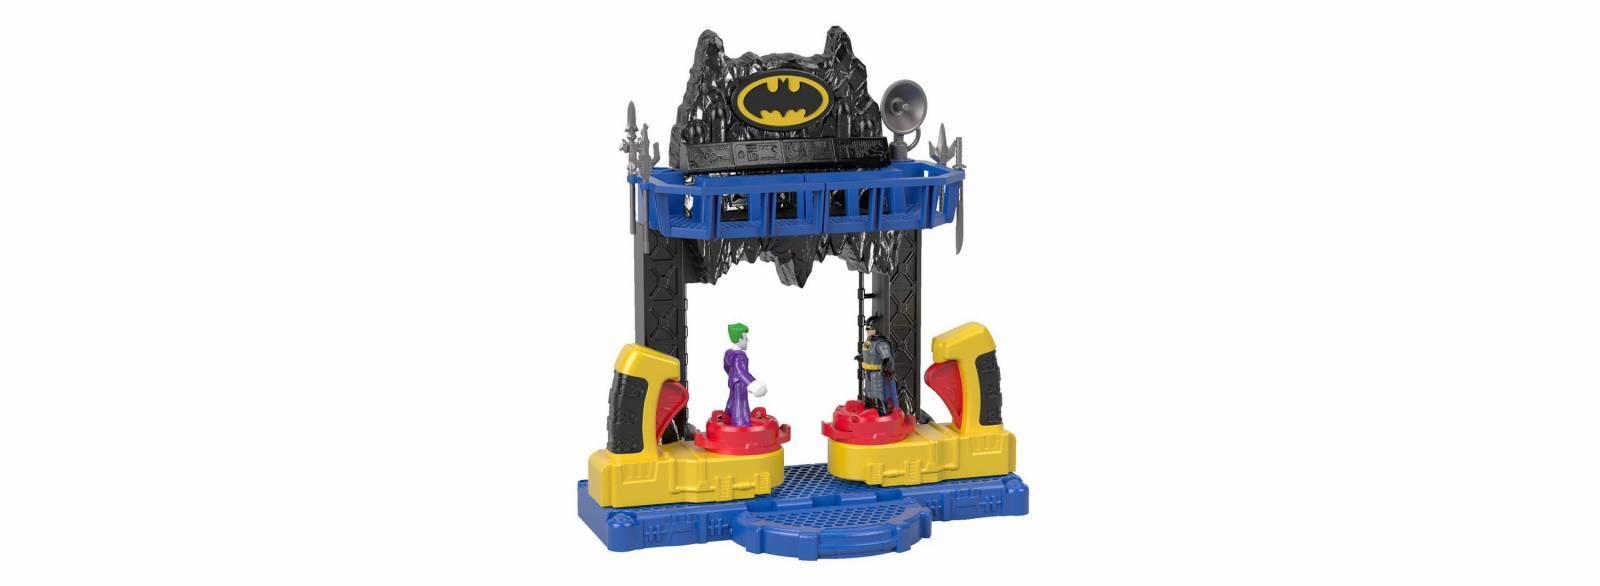 Batalha na Batcaverna DC Imaginext - MattelFKW12 - Noy Brinquedos